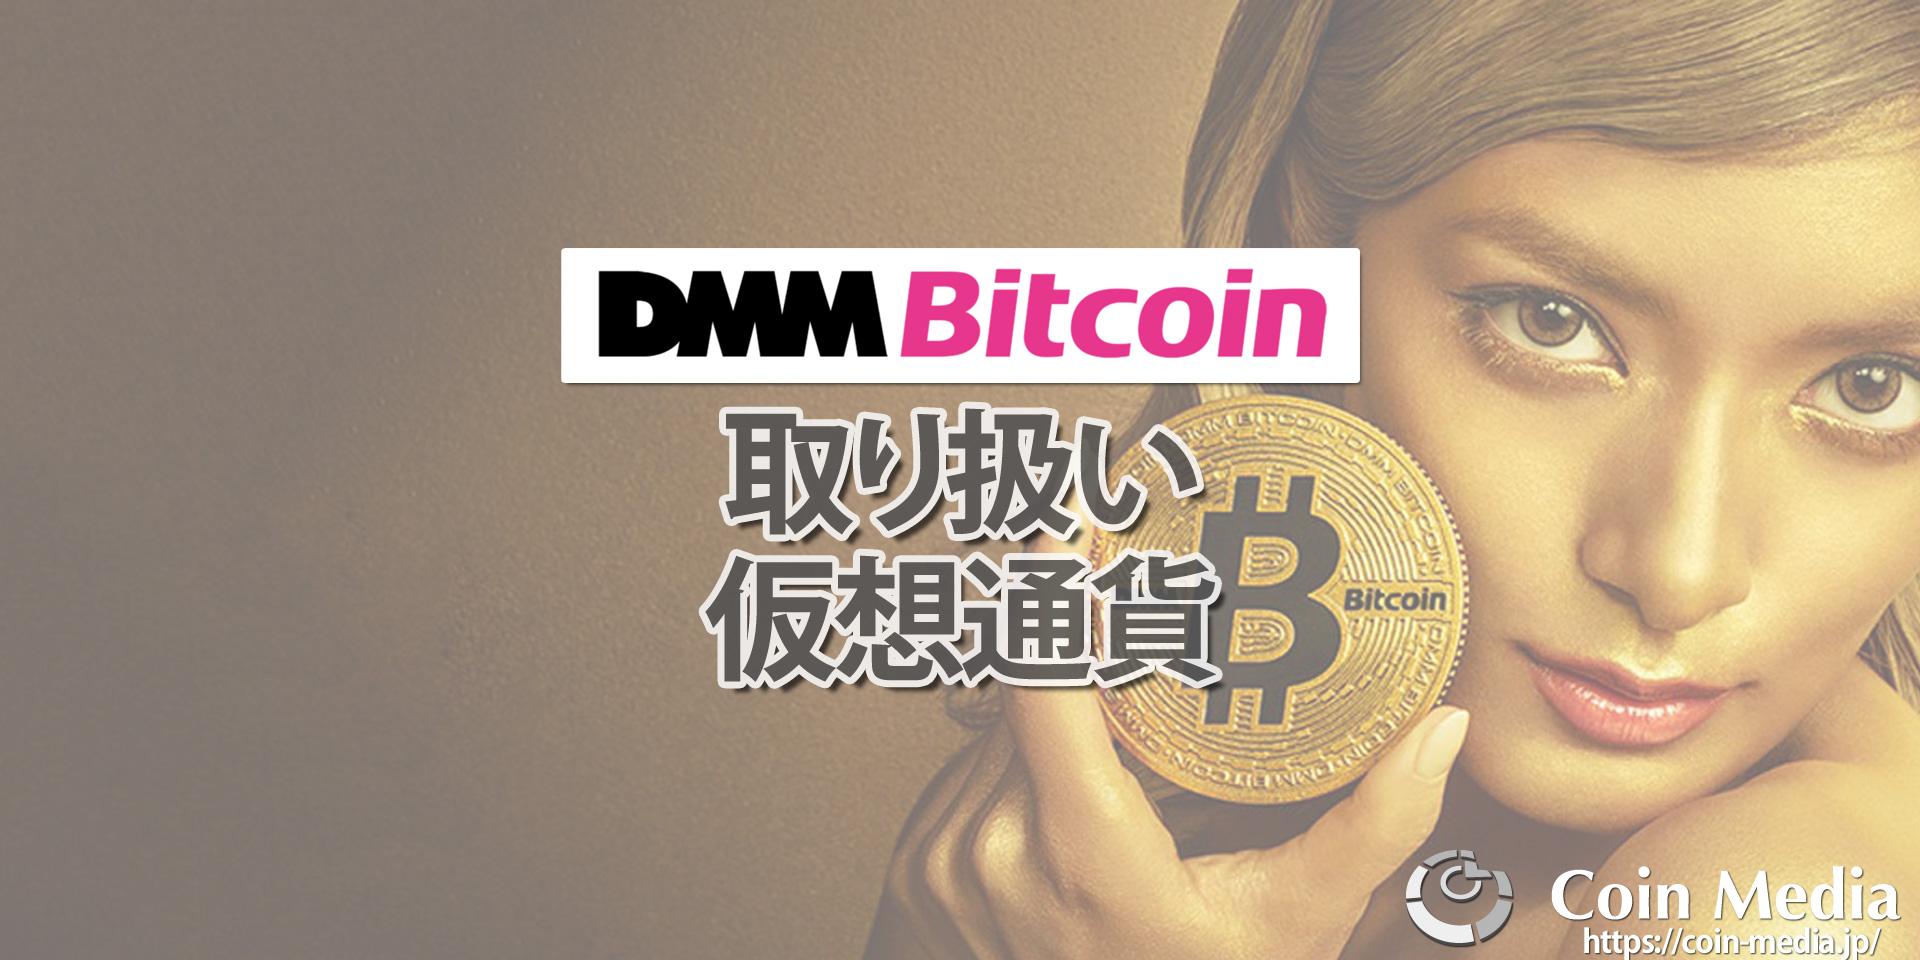 DMMビットコイン取り扱い仮想通貨